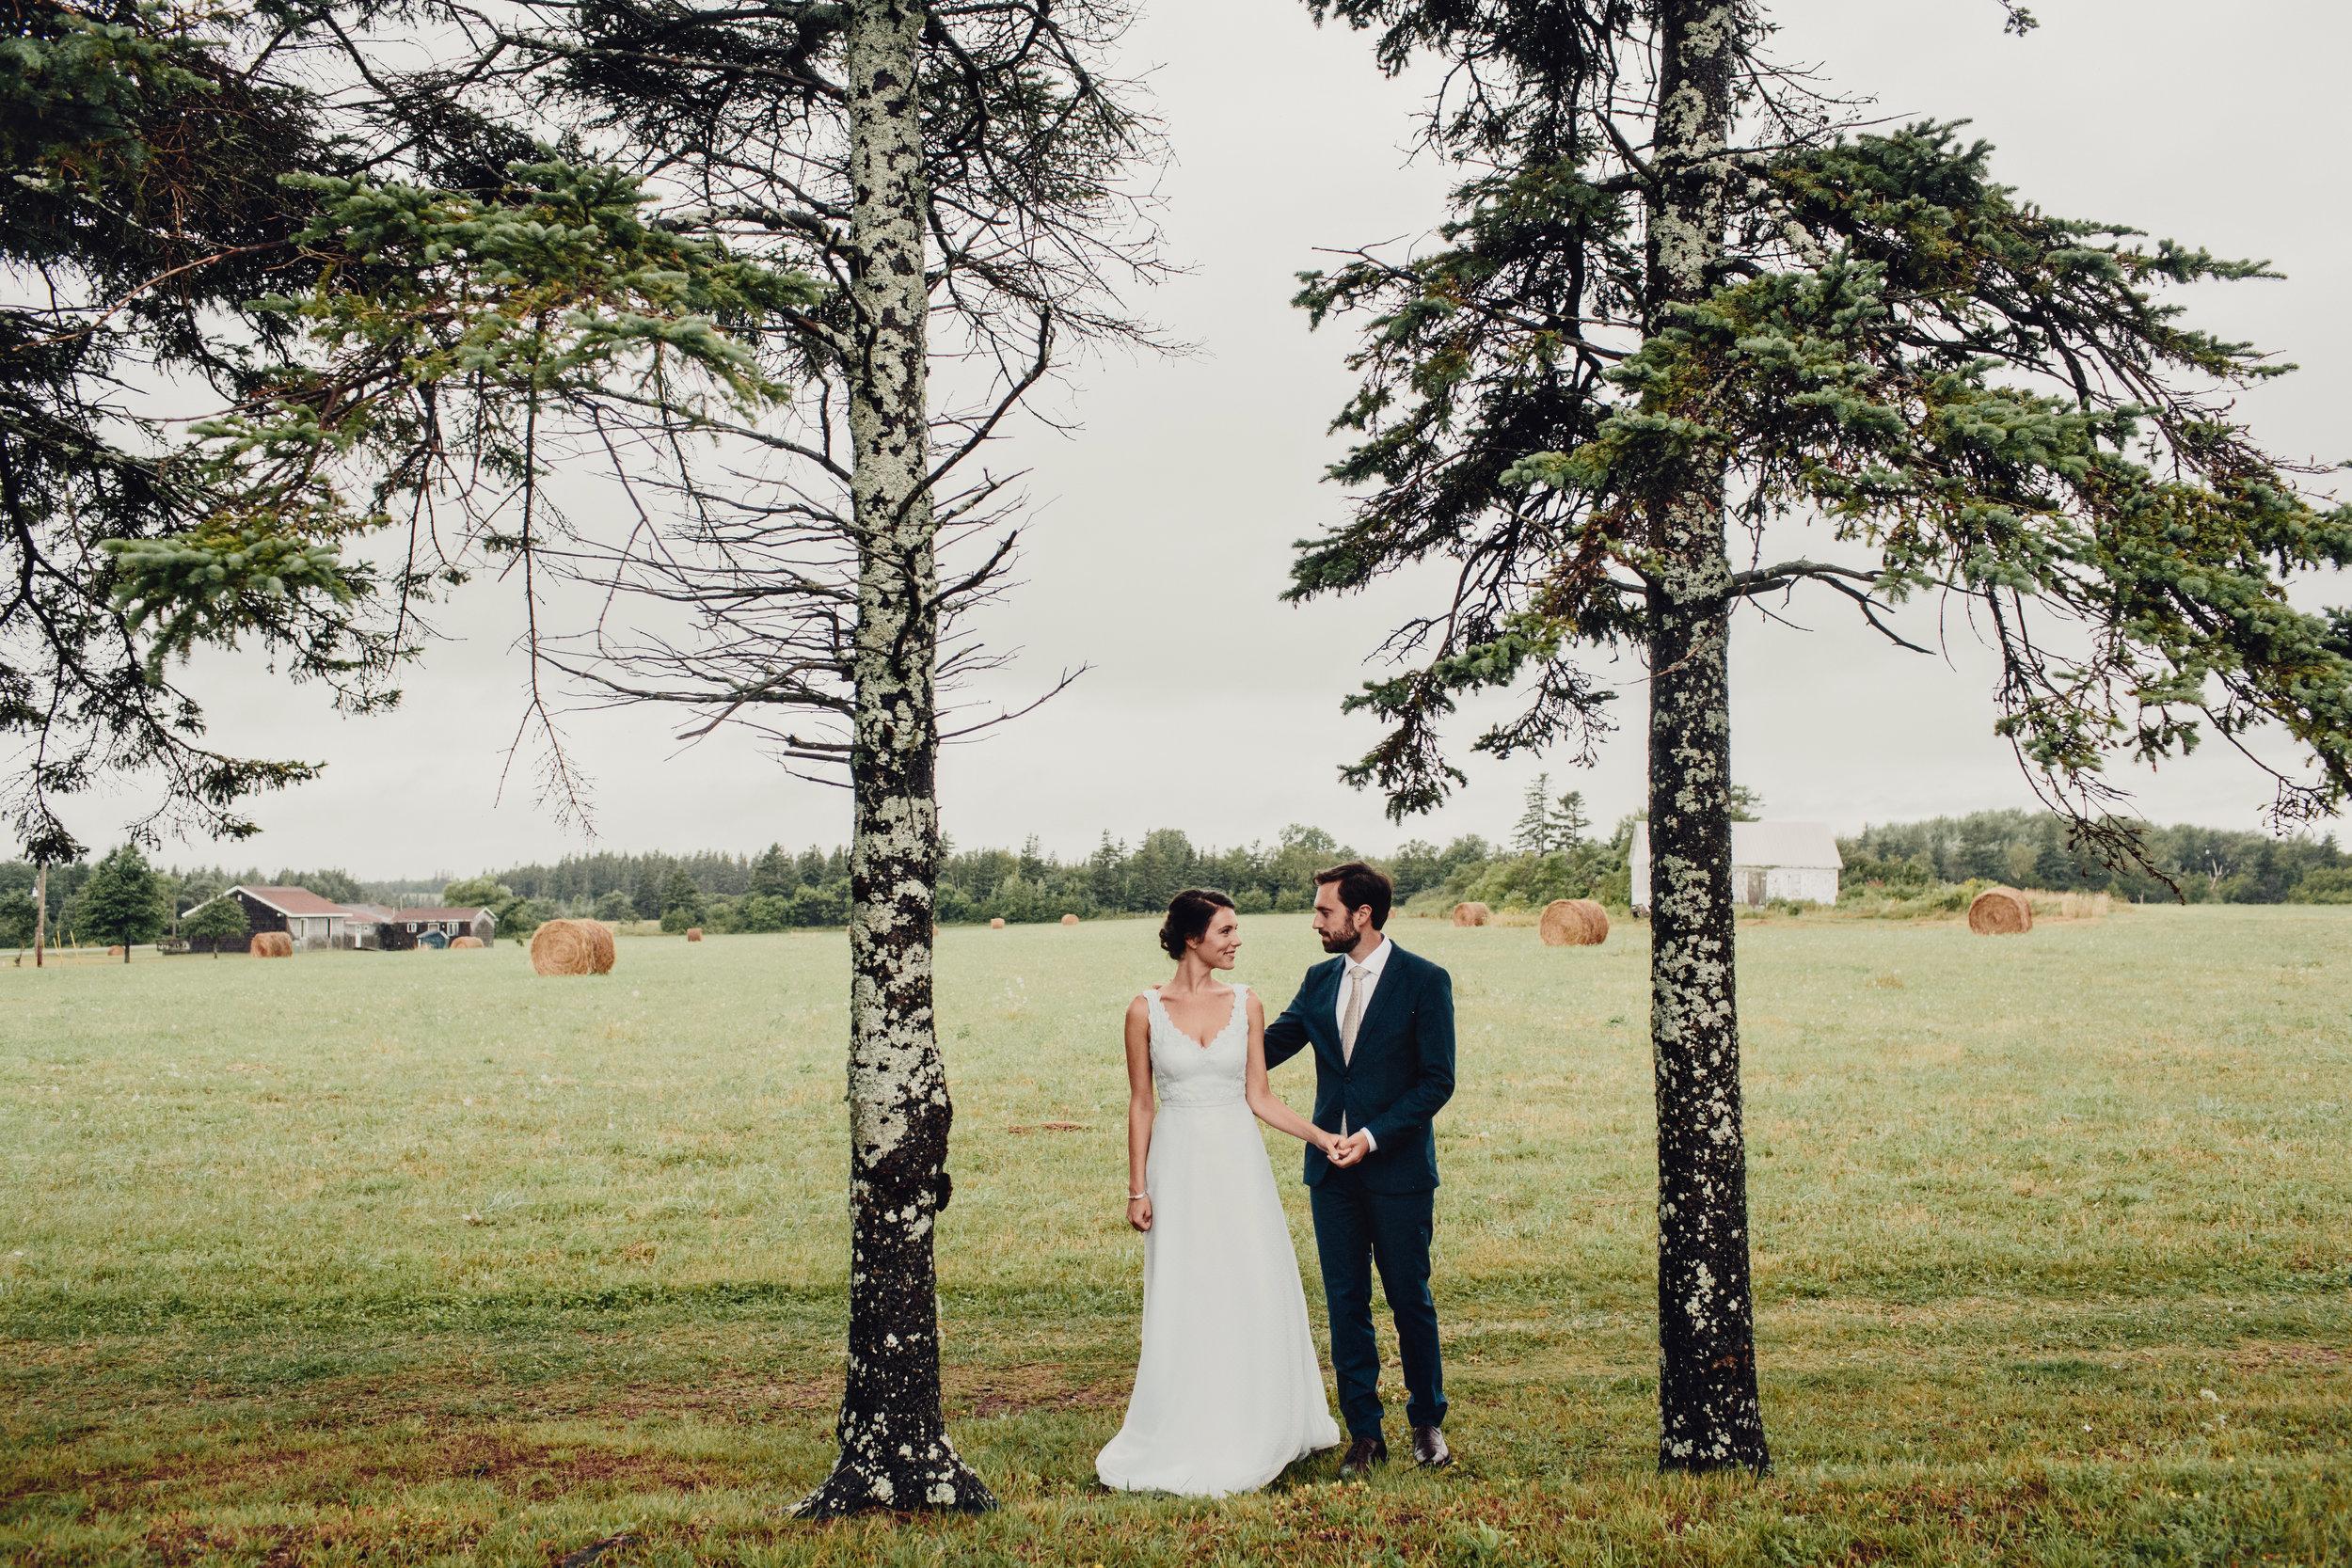 prince-edward-island-cottage-wedding-photos-0047.JPG